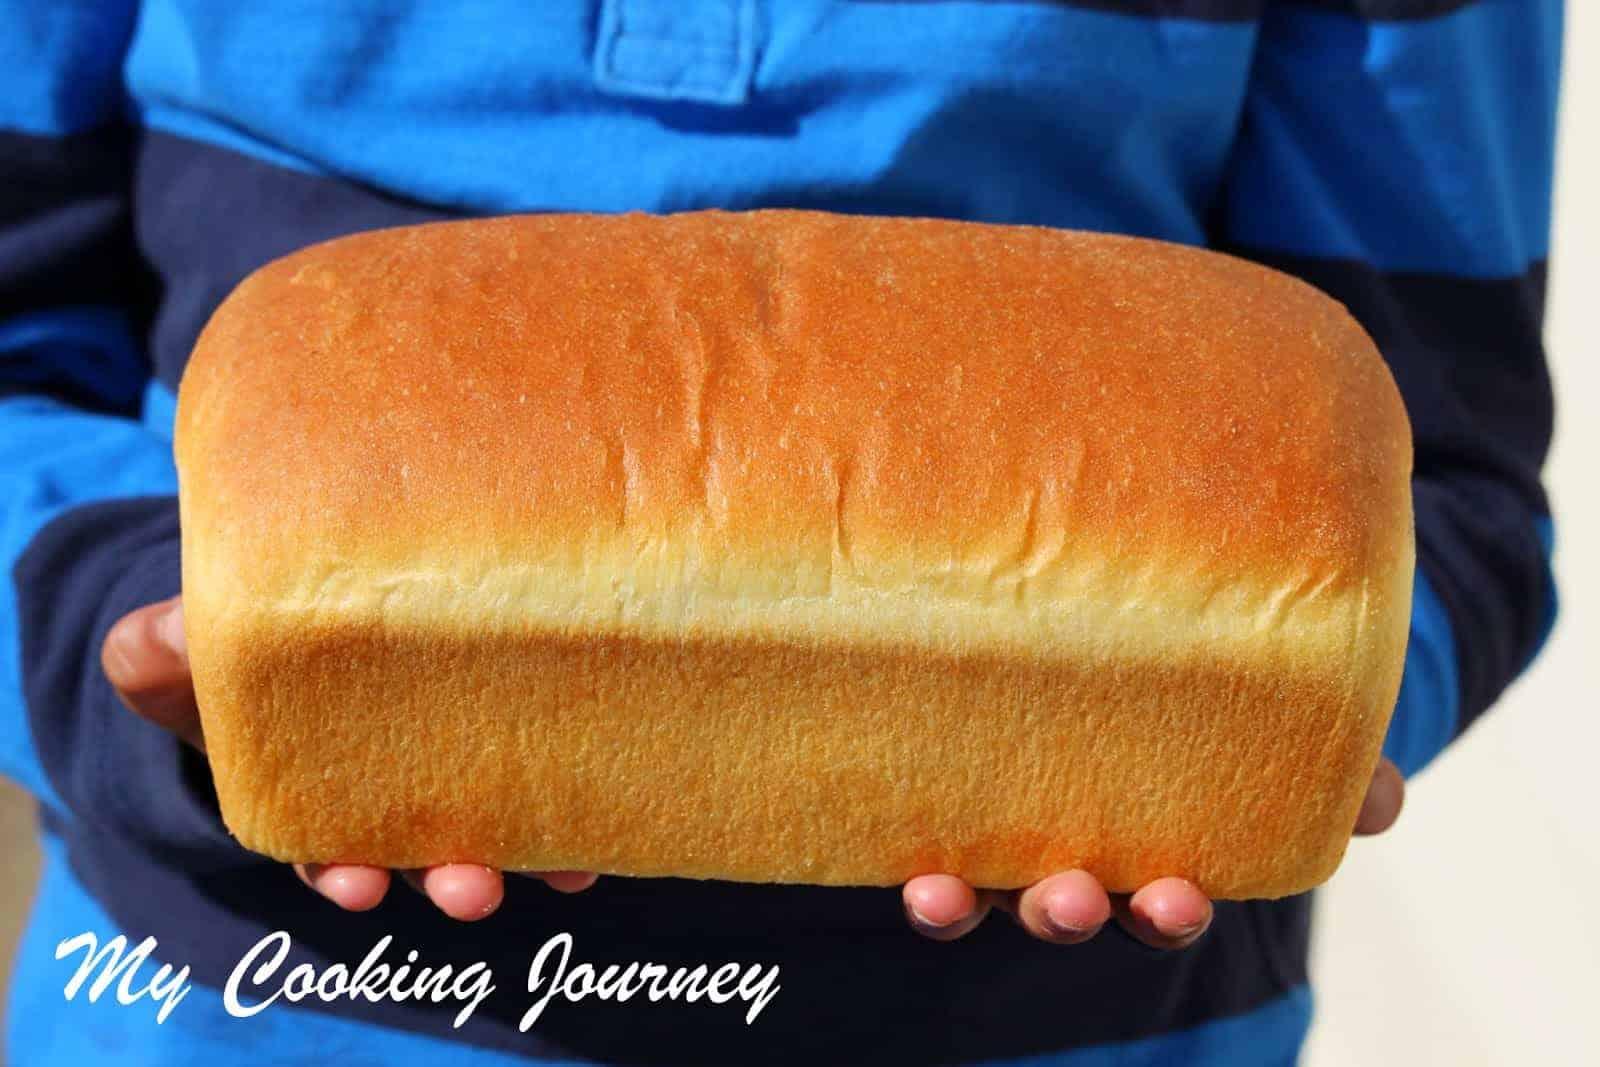 Semolina Bread loaf in hand